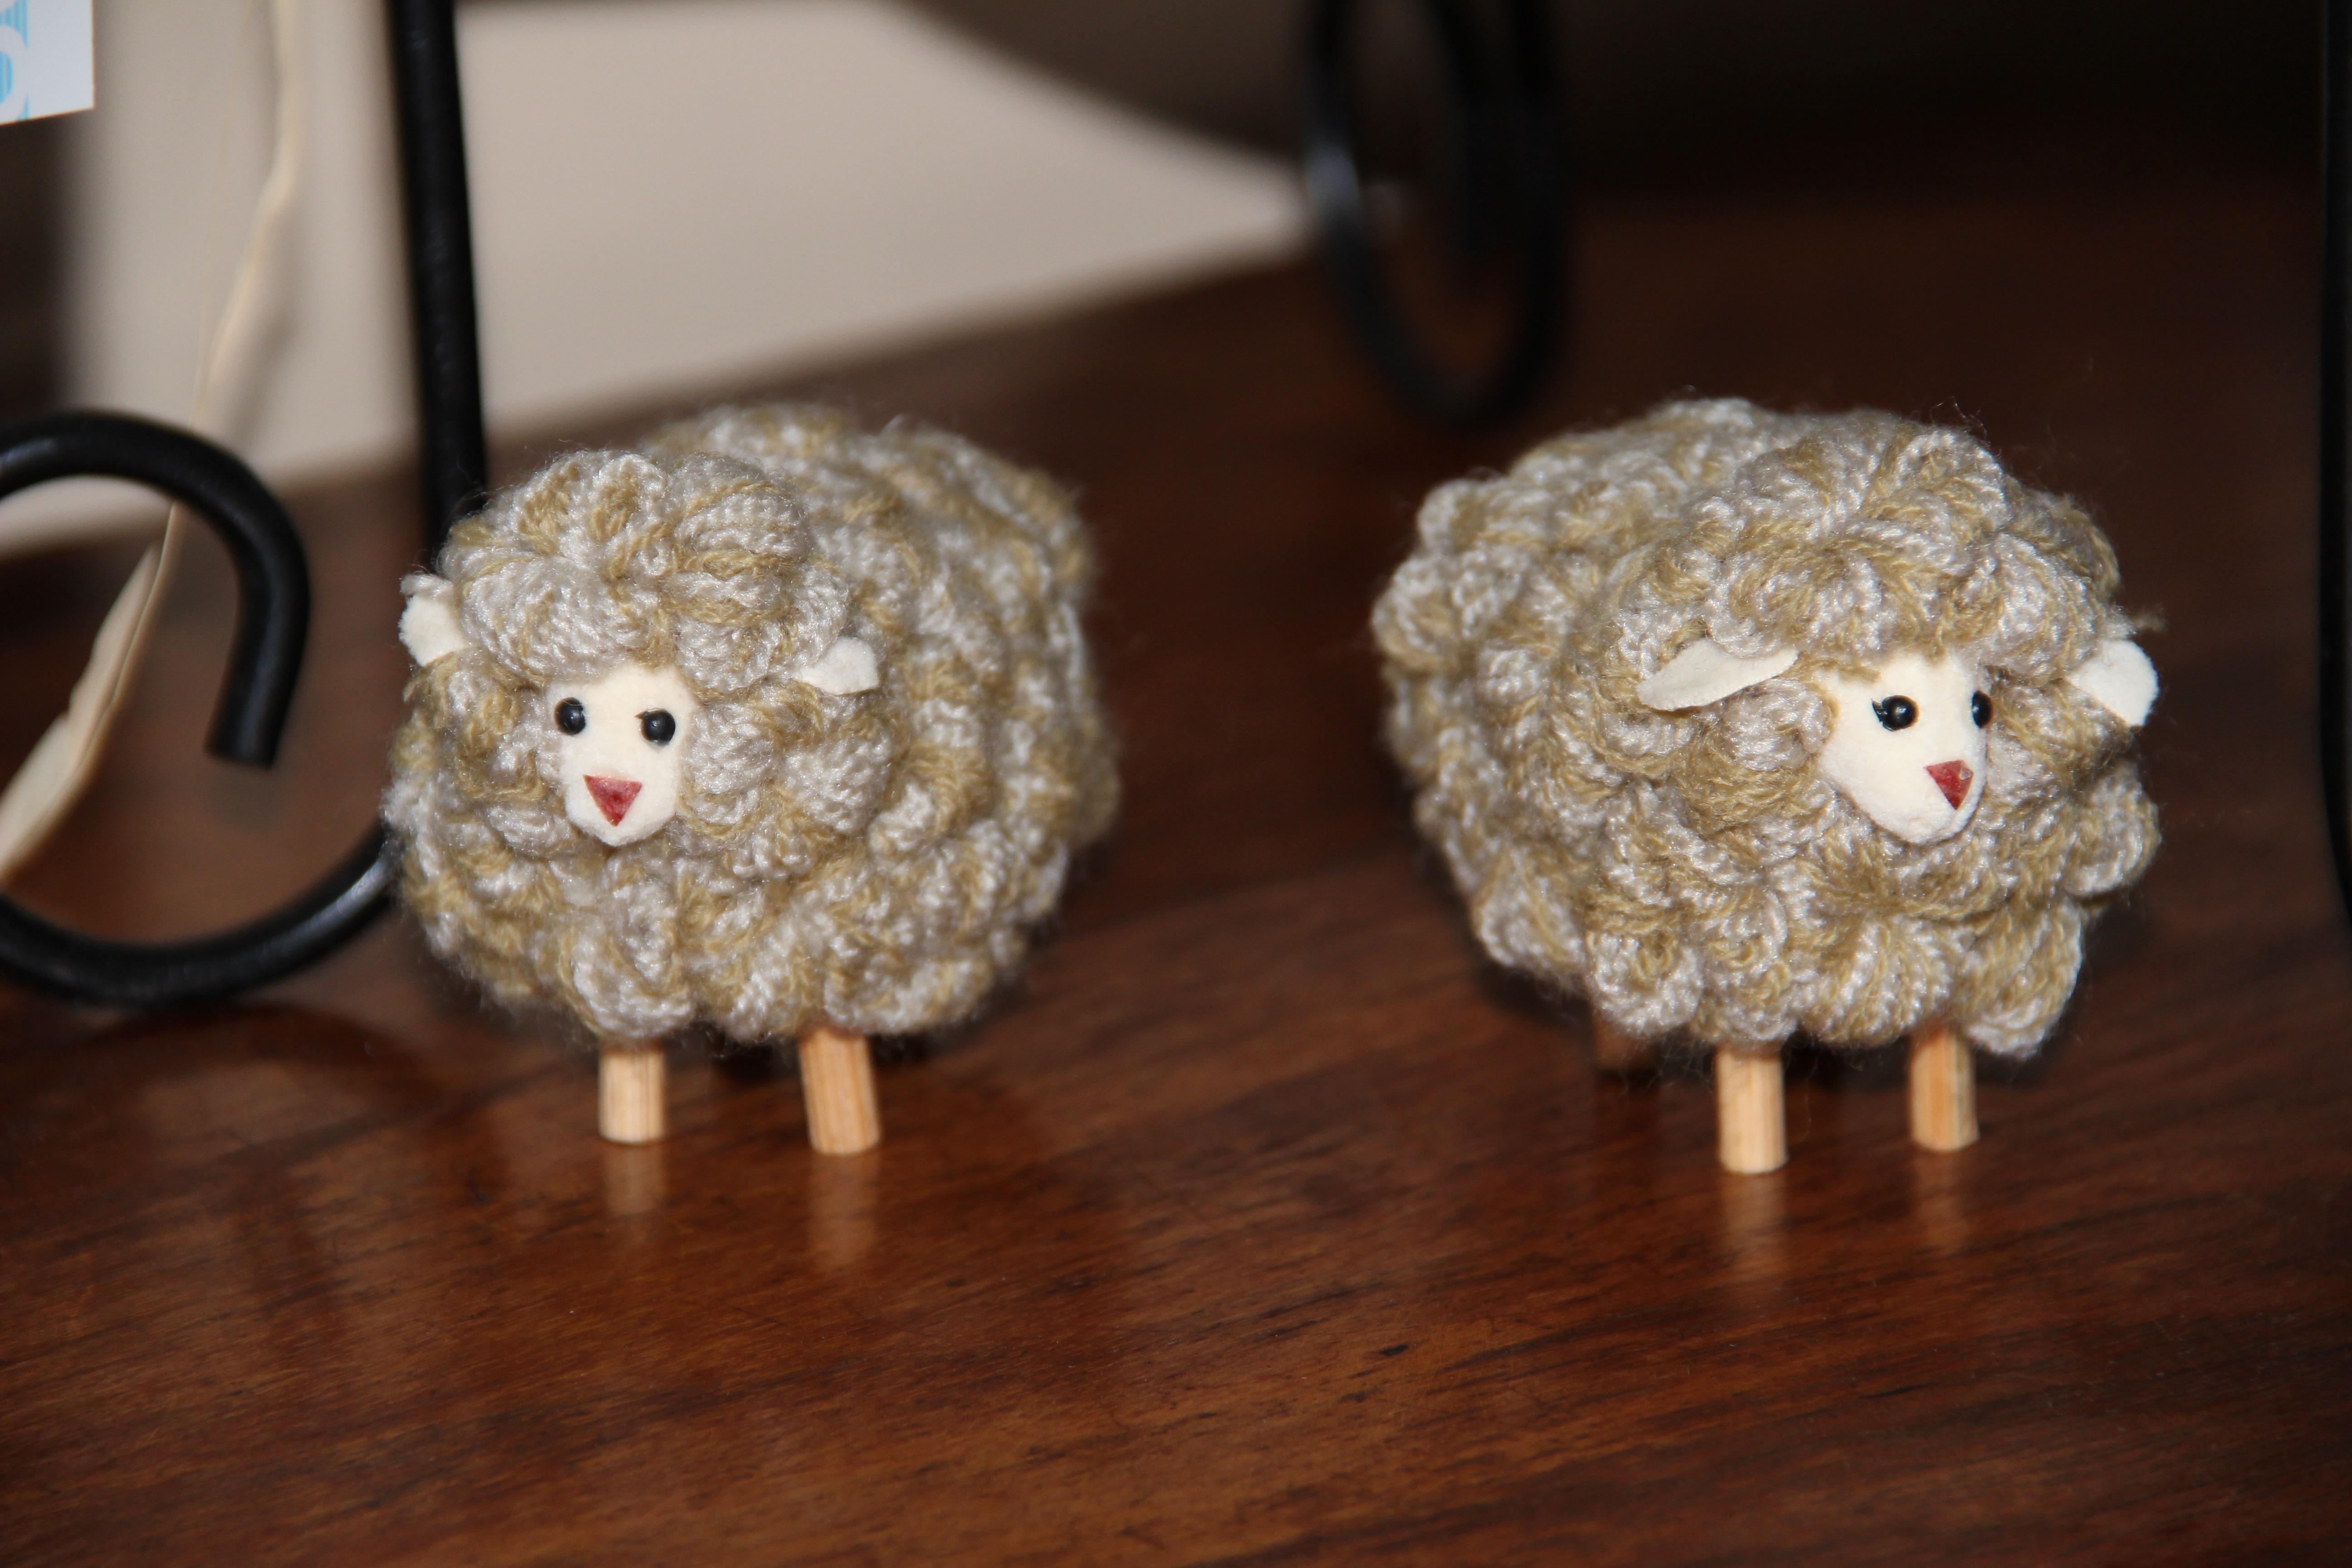 Fotos gratis : juguete, búho, lana, tejer, gabinete, art, erizo ...